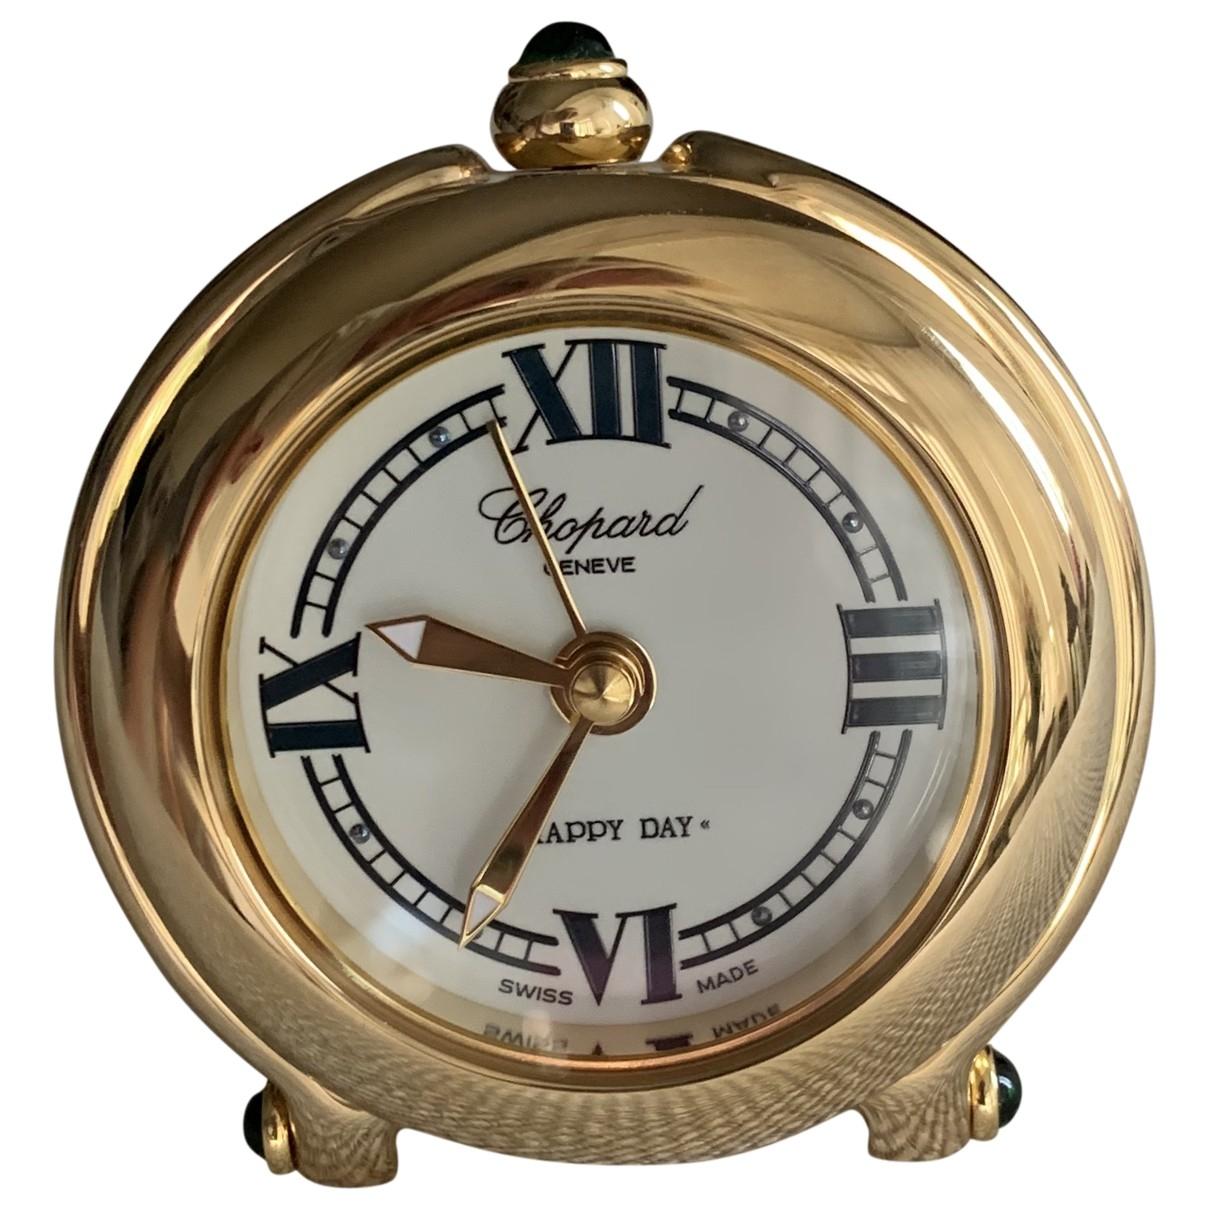 Reloj Chopard